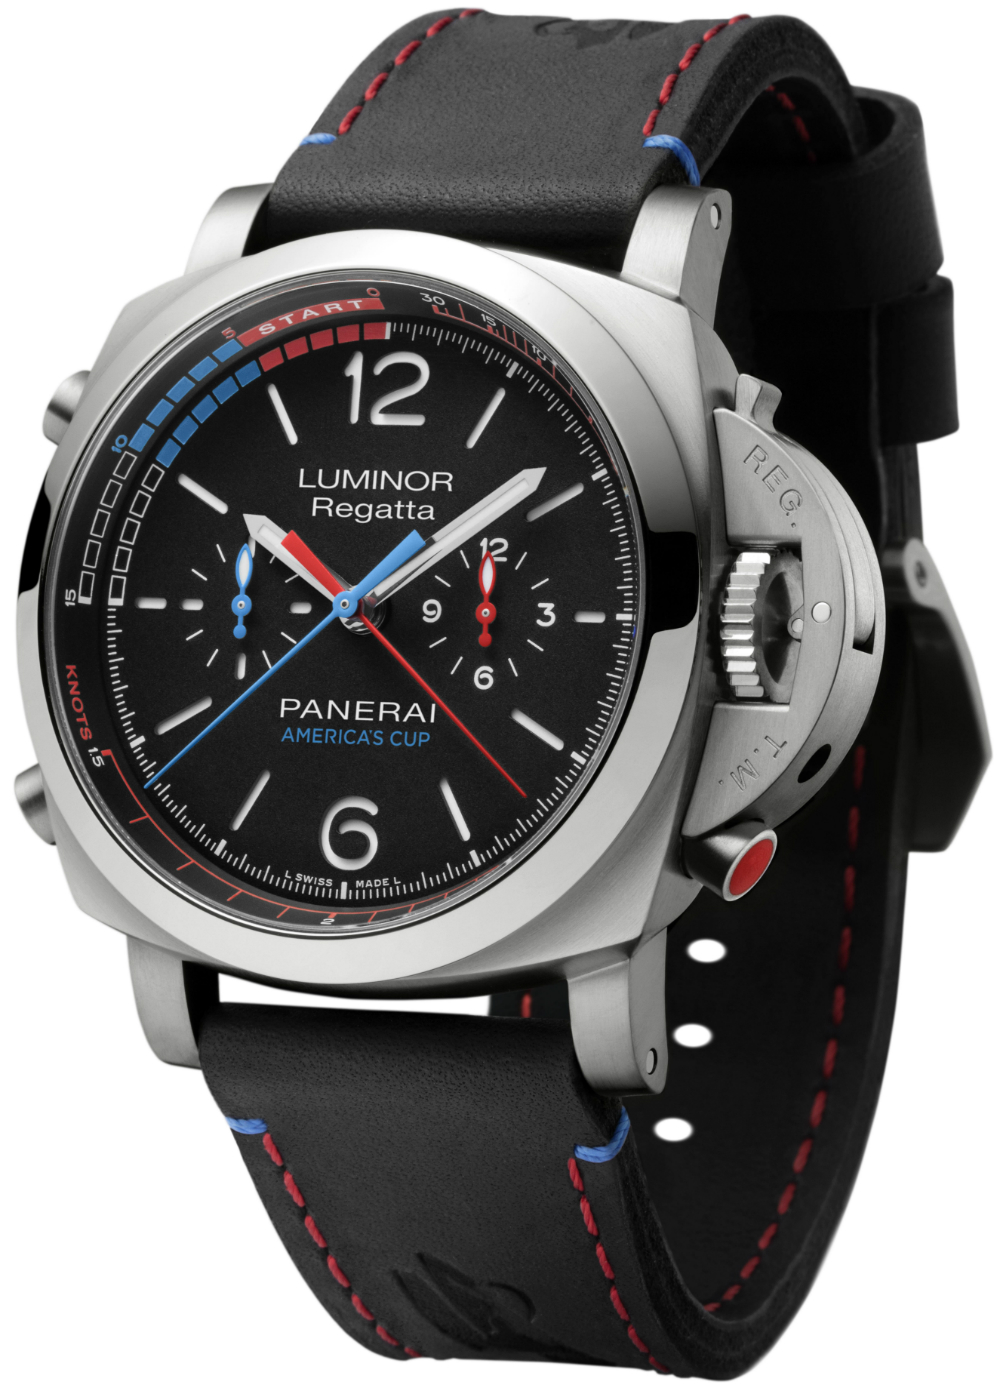 Name:  Panerai-Luminor-1950-Regatta-Oracle-Team-USA-3-Days-Chrono-Flyback-Automatic-Titanio-PAM00726-2.jpg Views: 45 Size:  646.2 KB